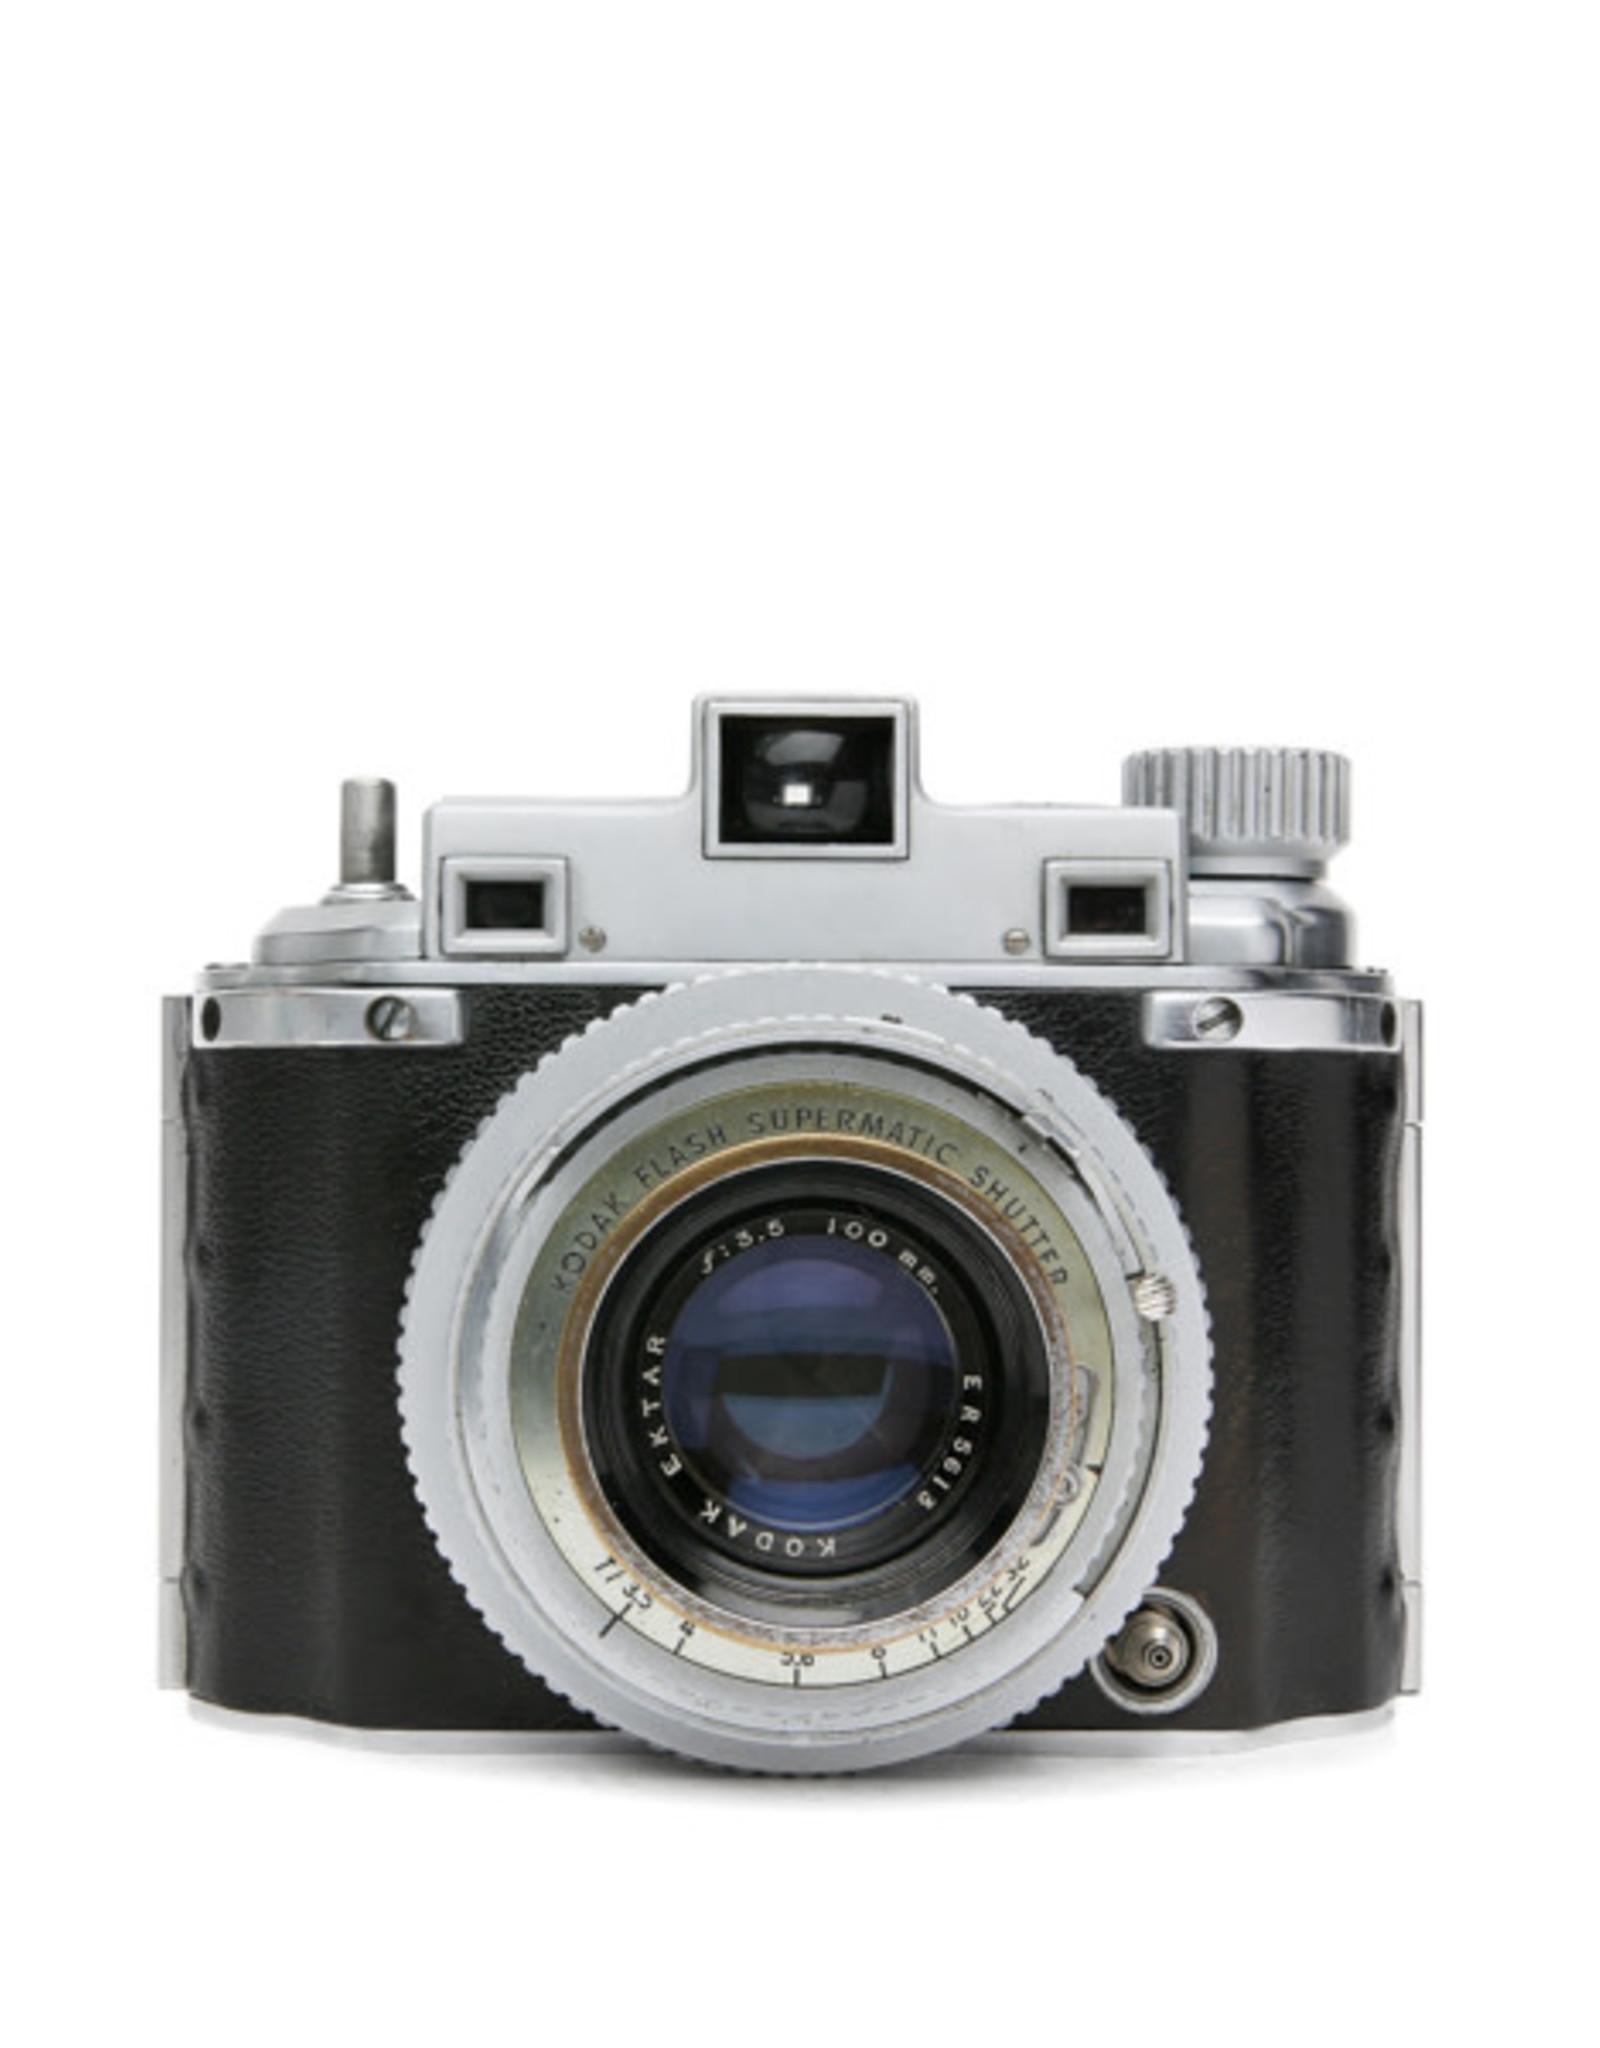 kodak Kodak Medalist II 620 (120) Medium Format Rangefinder Camera w/case